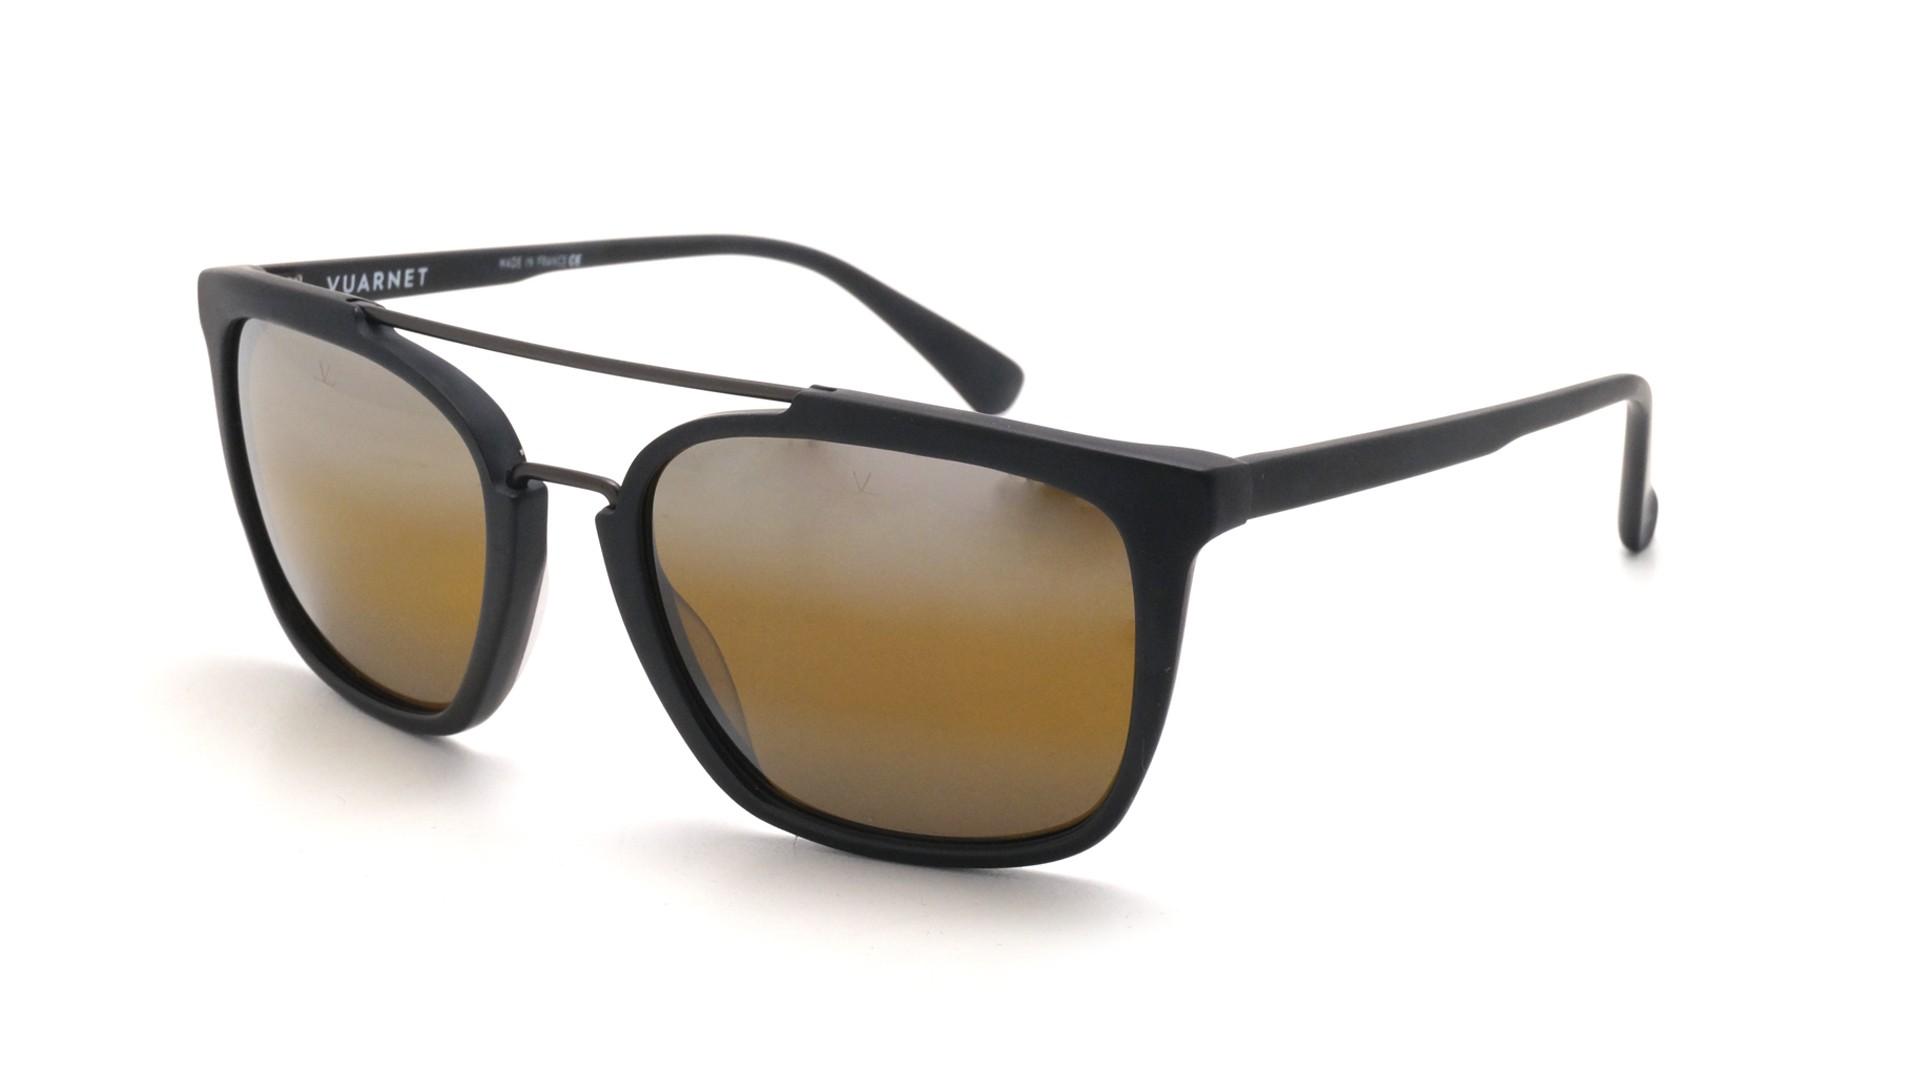 d4b53e2c600d Sunglasses Vuarnet Cable car rectangle Black Matte Skilynx VL1601 0002  55-18 Medium Gradient Mirror